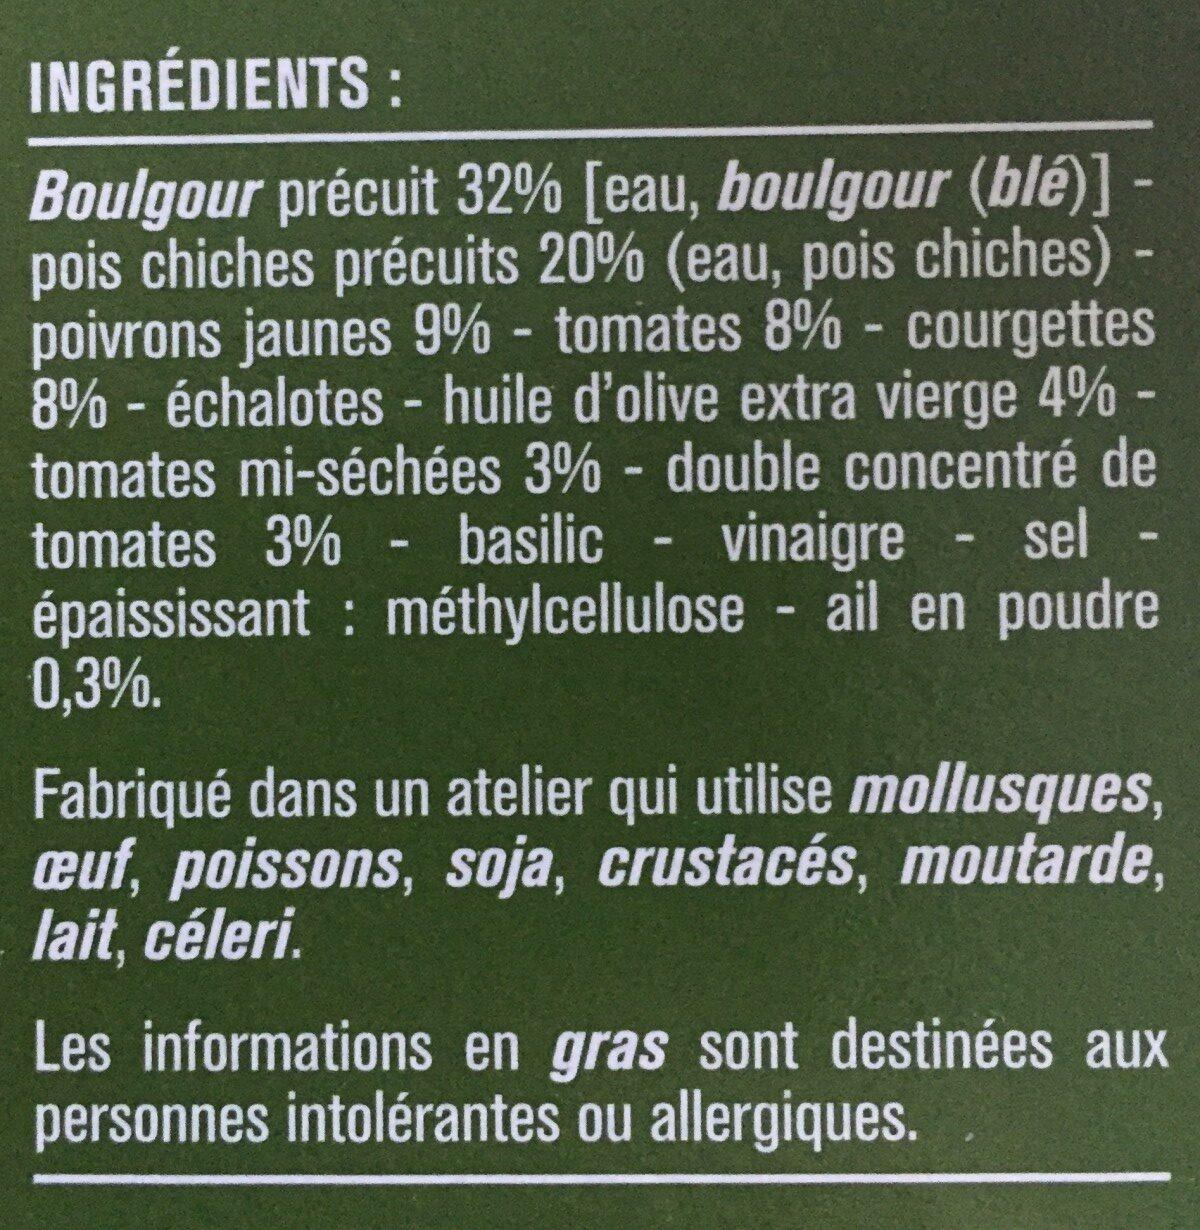 Galette provençal boulgour pois chiches - Ingredients